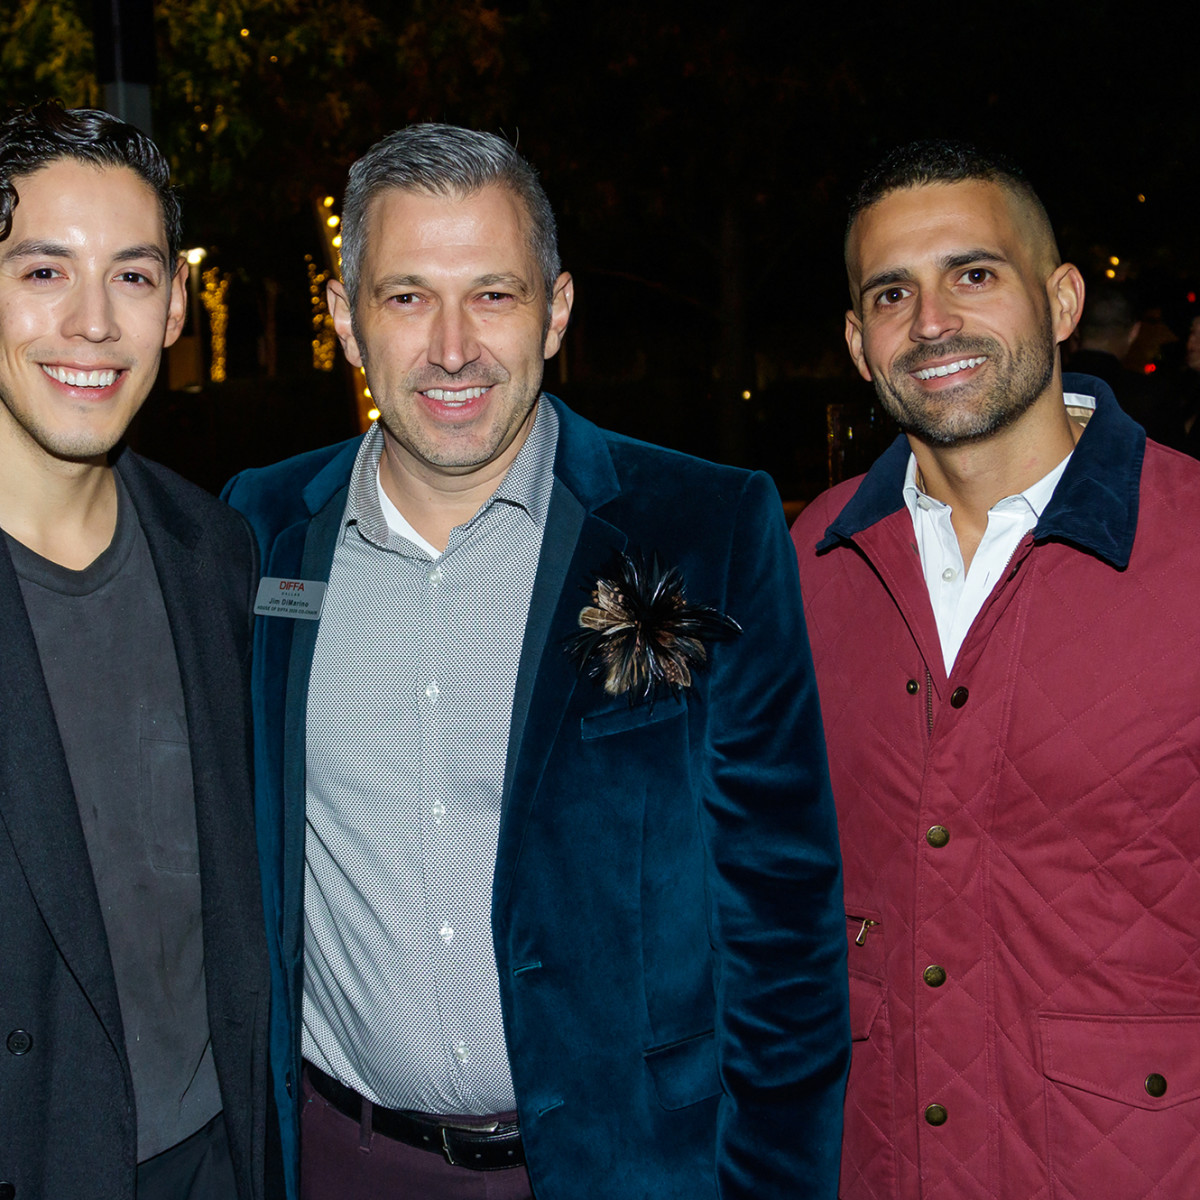 David Gonzalez, Jim DiMarino, Kelvin Moreno